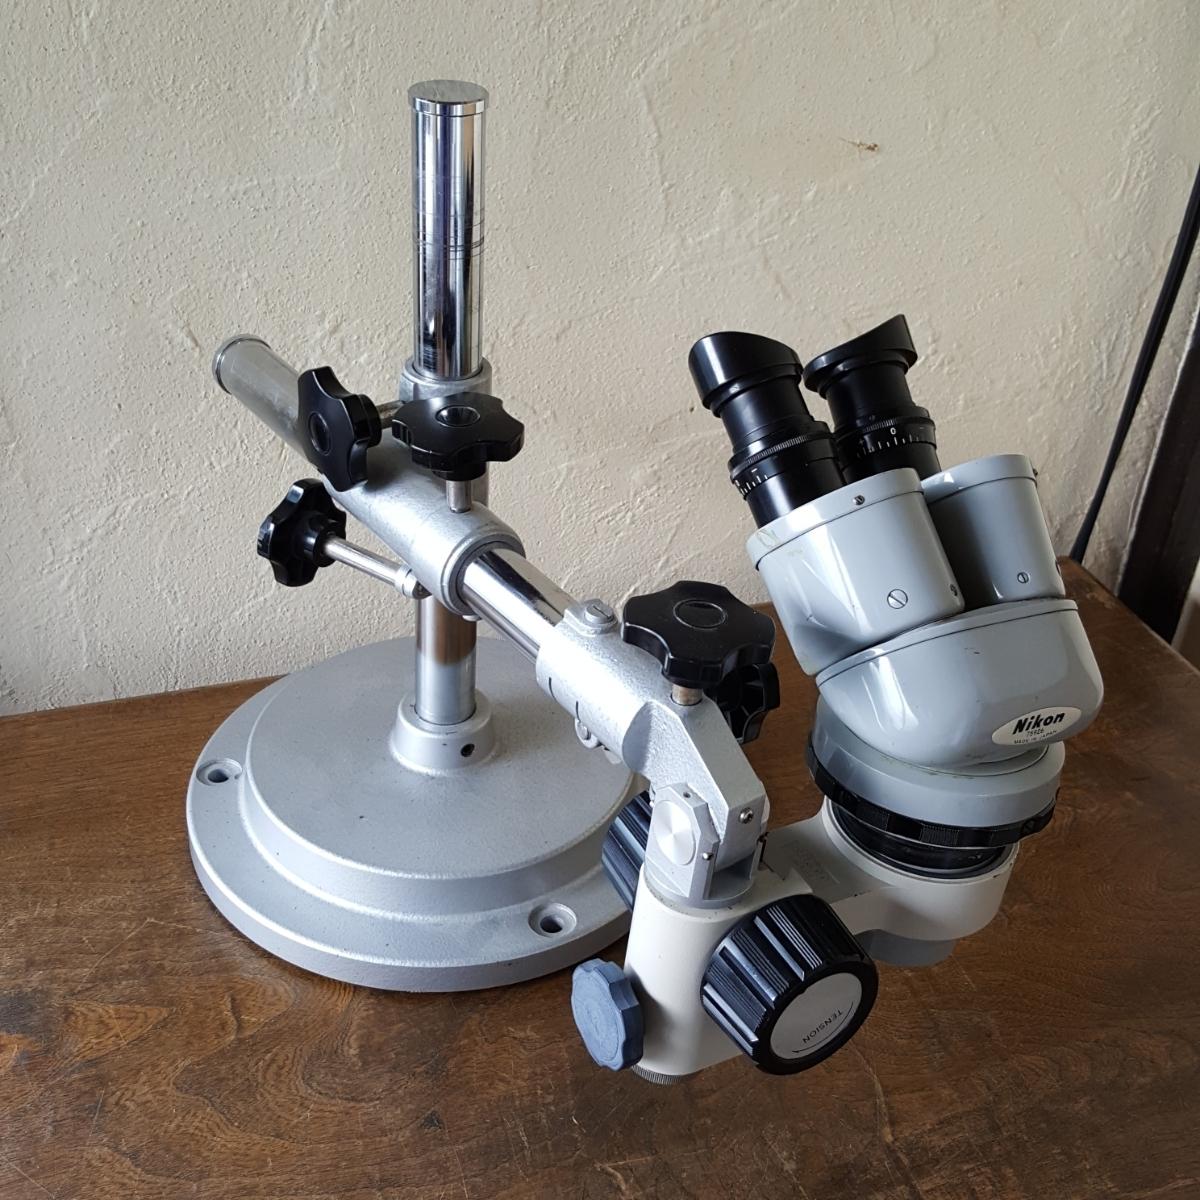 NIKON 実体顕微鏡 レンズ N10x SEIKO 日本製 検査 精密 機器 病院 歯科 顕微鏡 計器 接眼 双眼 ニコン セイコー スタンド 台座 中古 現状